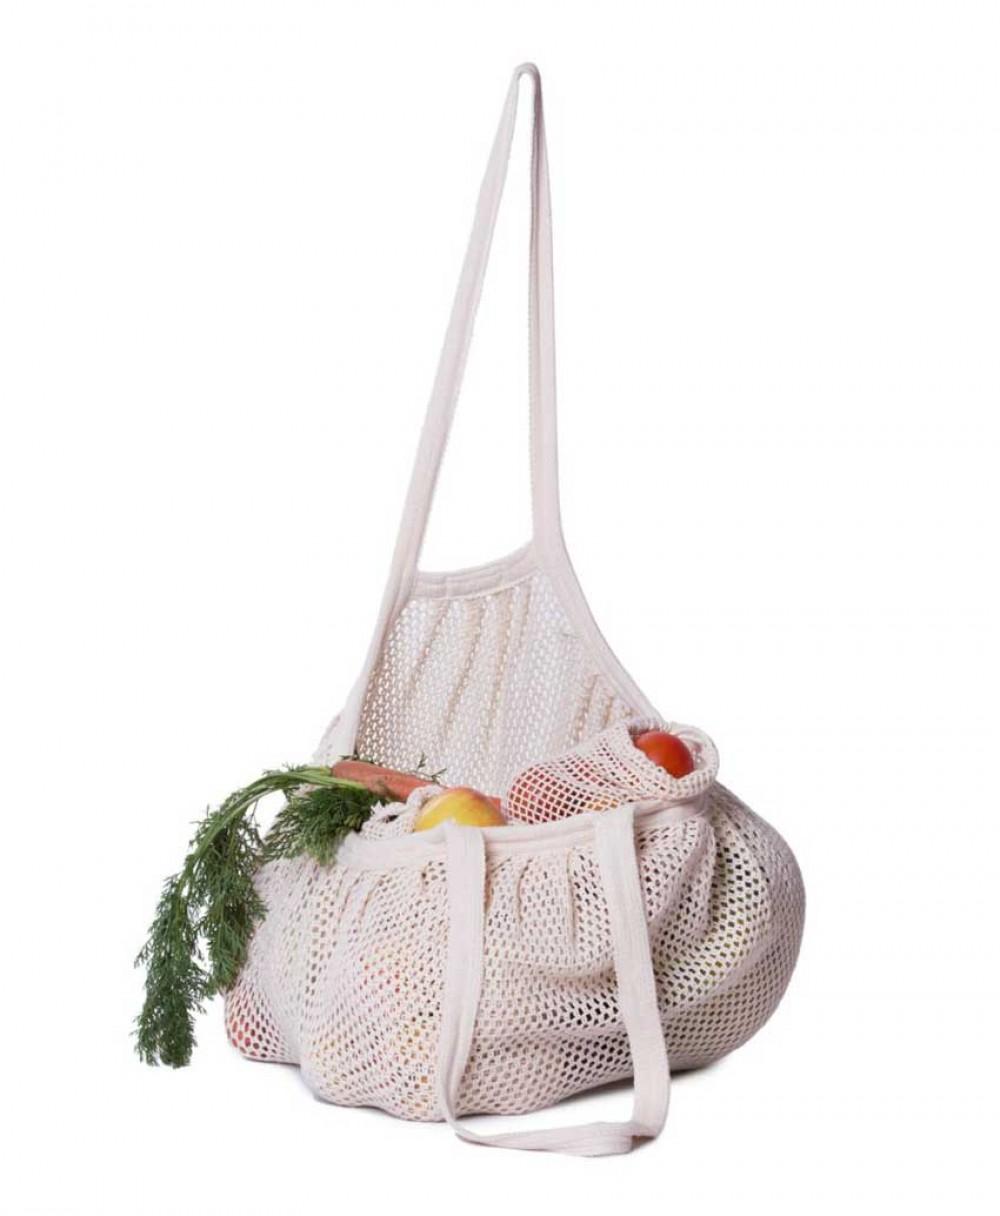 67ec9e26f81 STARNET Bag, Τσάντα με πυκνό δίχτυ από βιολογικό βαμβάκι - Natural ...